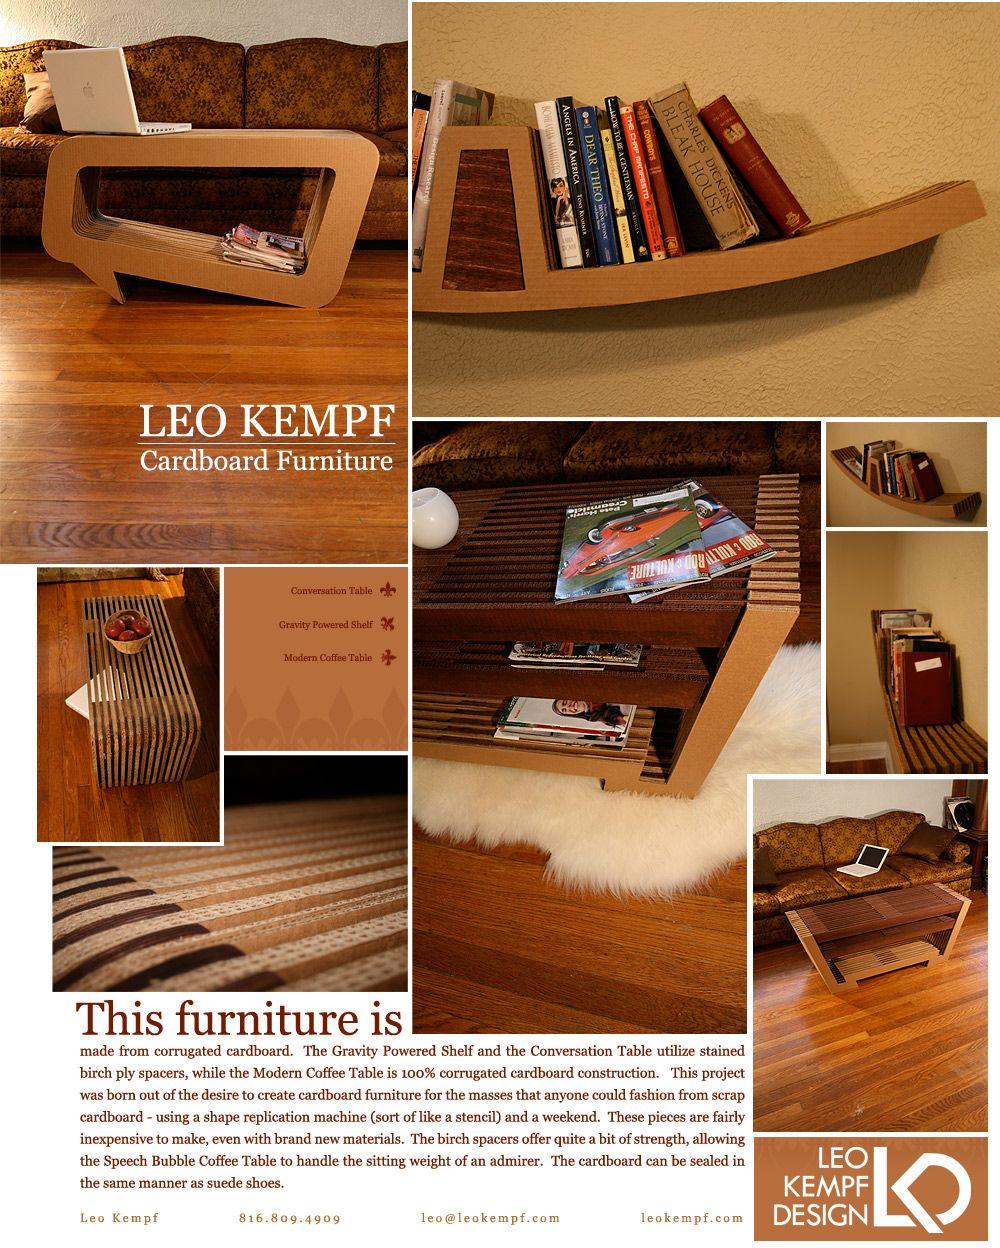 esto quedaria muy bien en la sala  Leo Kempf: Cardboard furniture